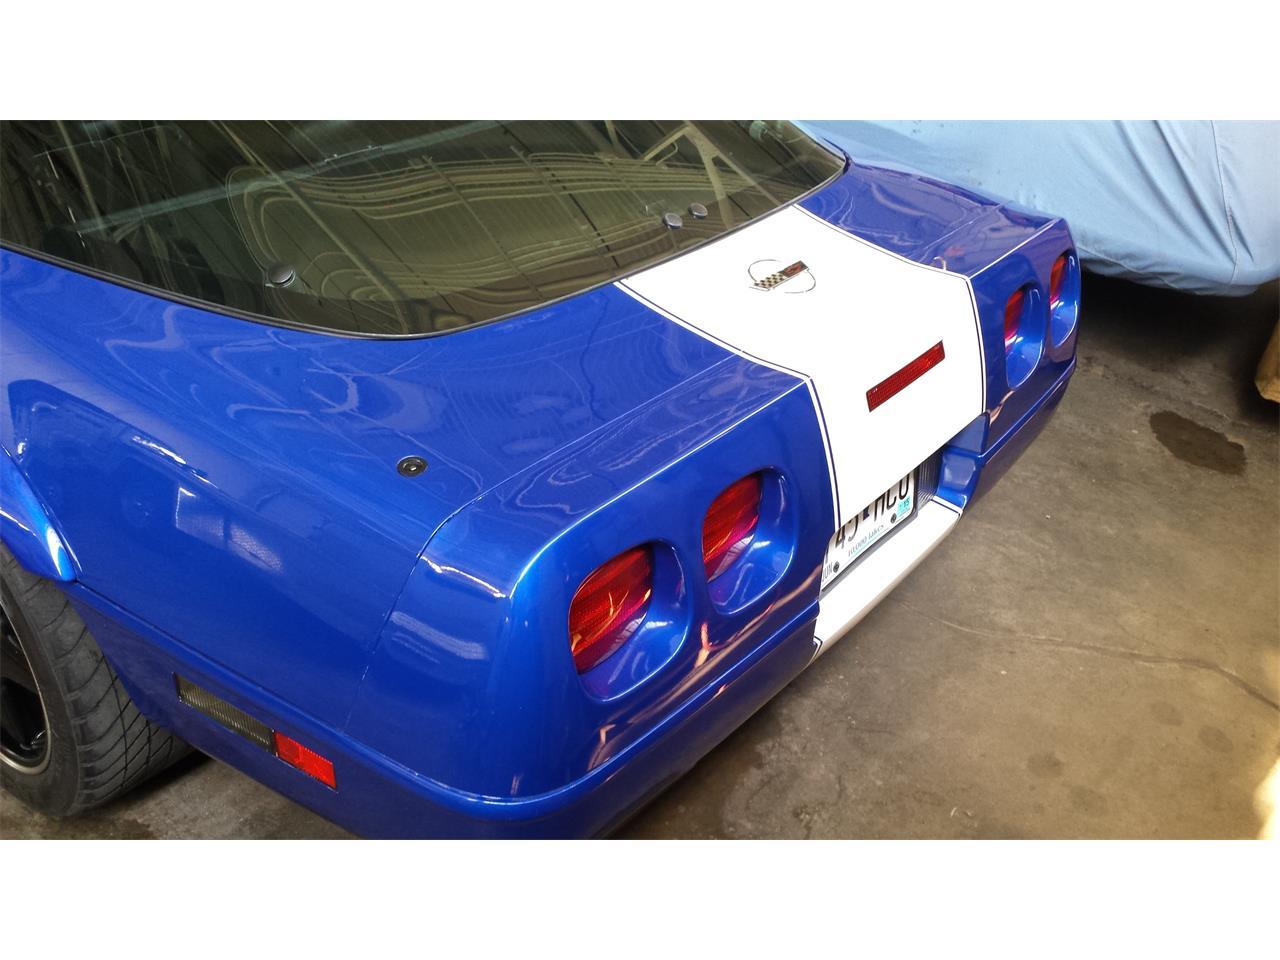 Large Picture of '96 Chevrolet Corvette - $36,000.00 - MXIW